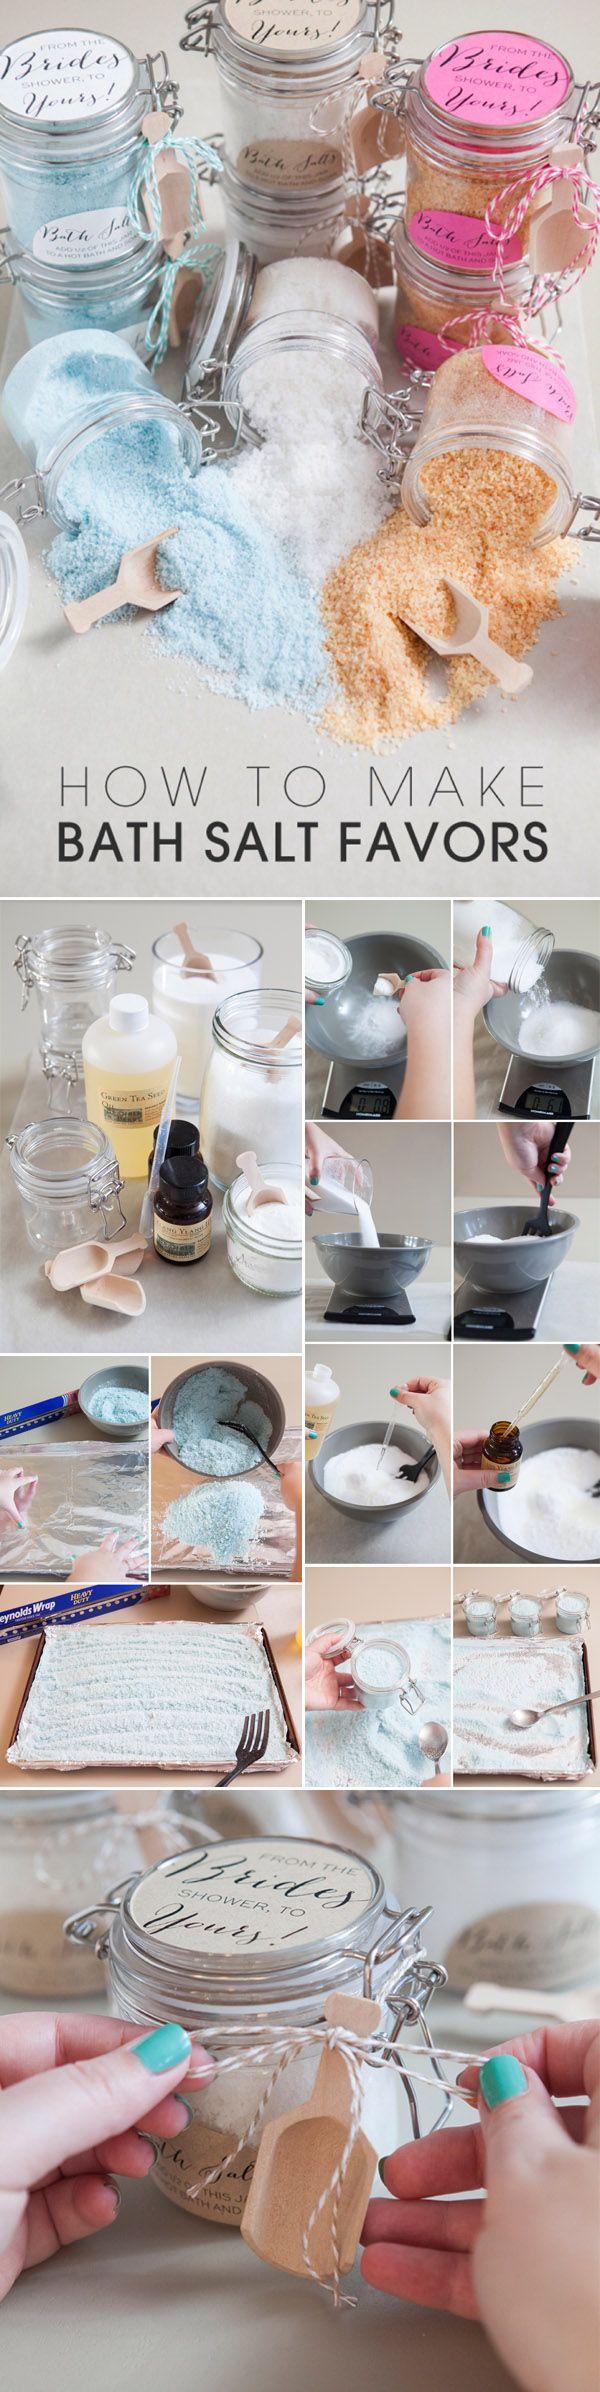 DIY bath salt wedding favors your guest will love